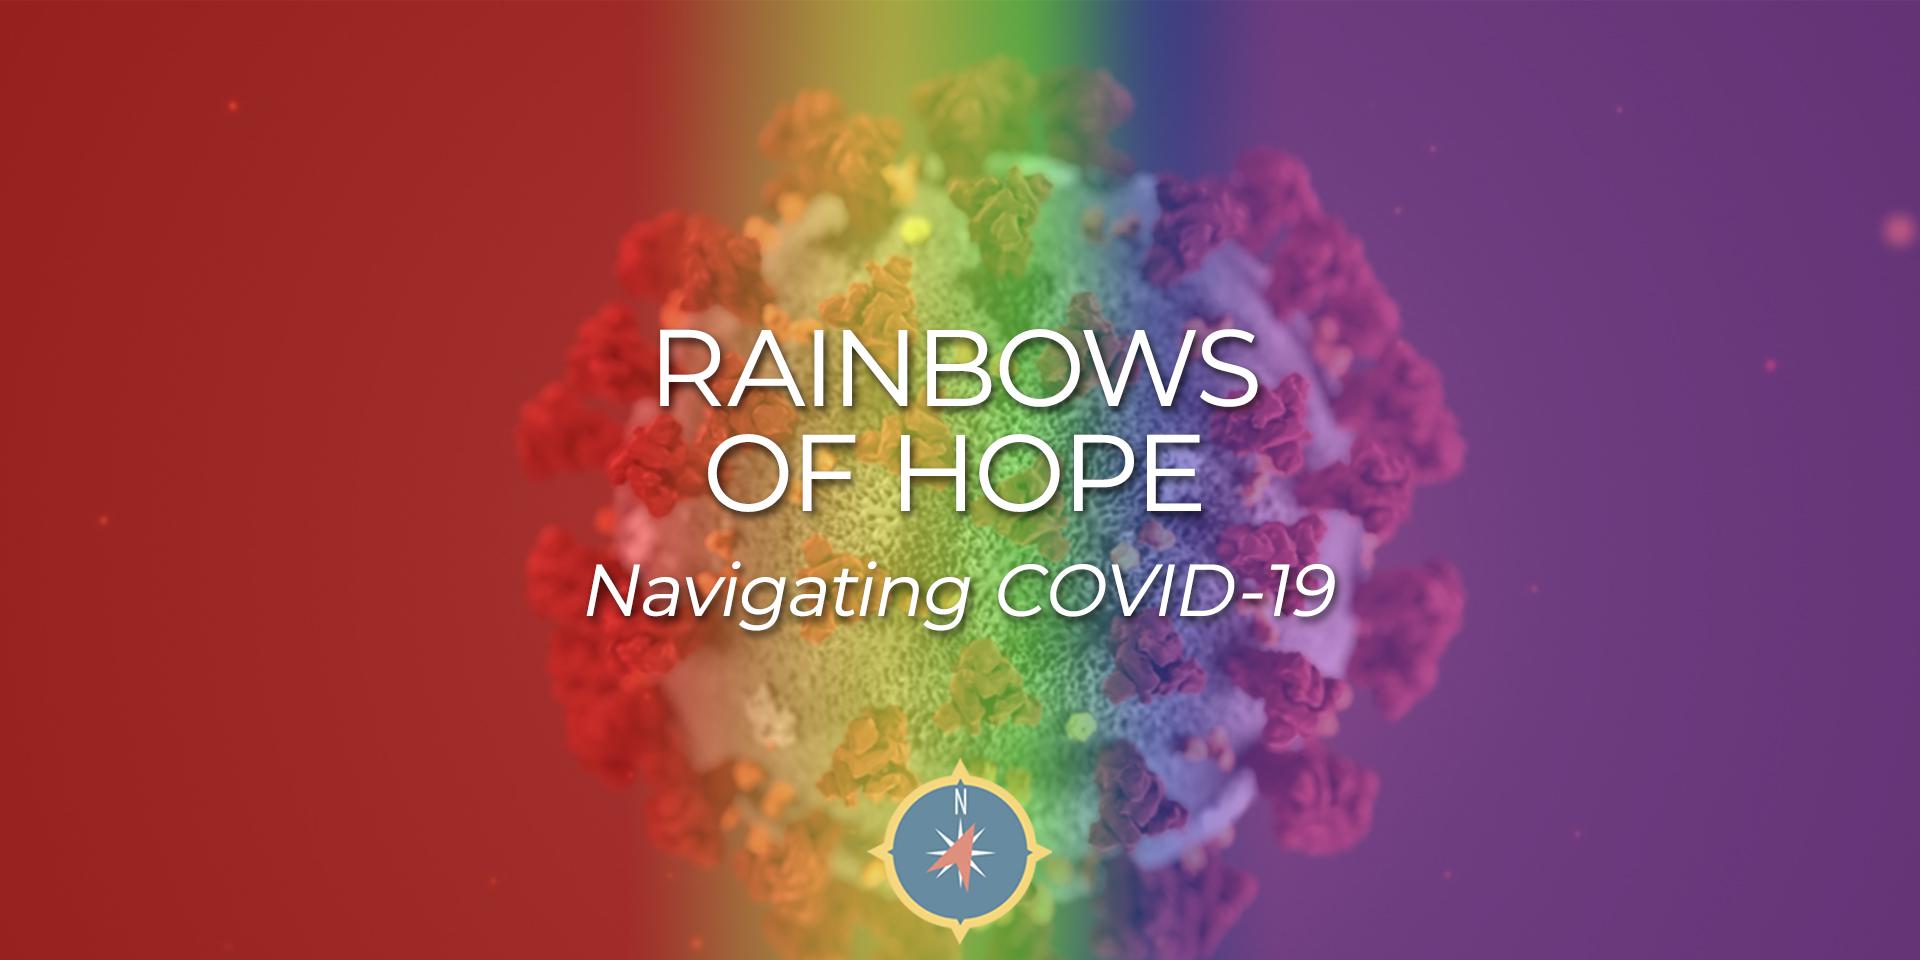 rainbows-hope-covid-19